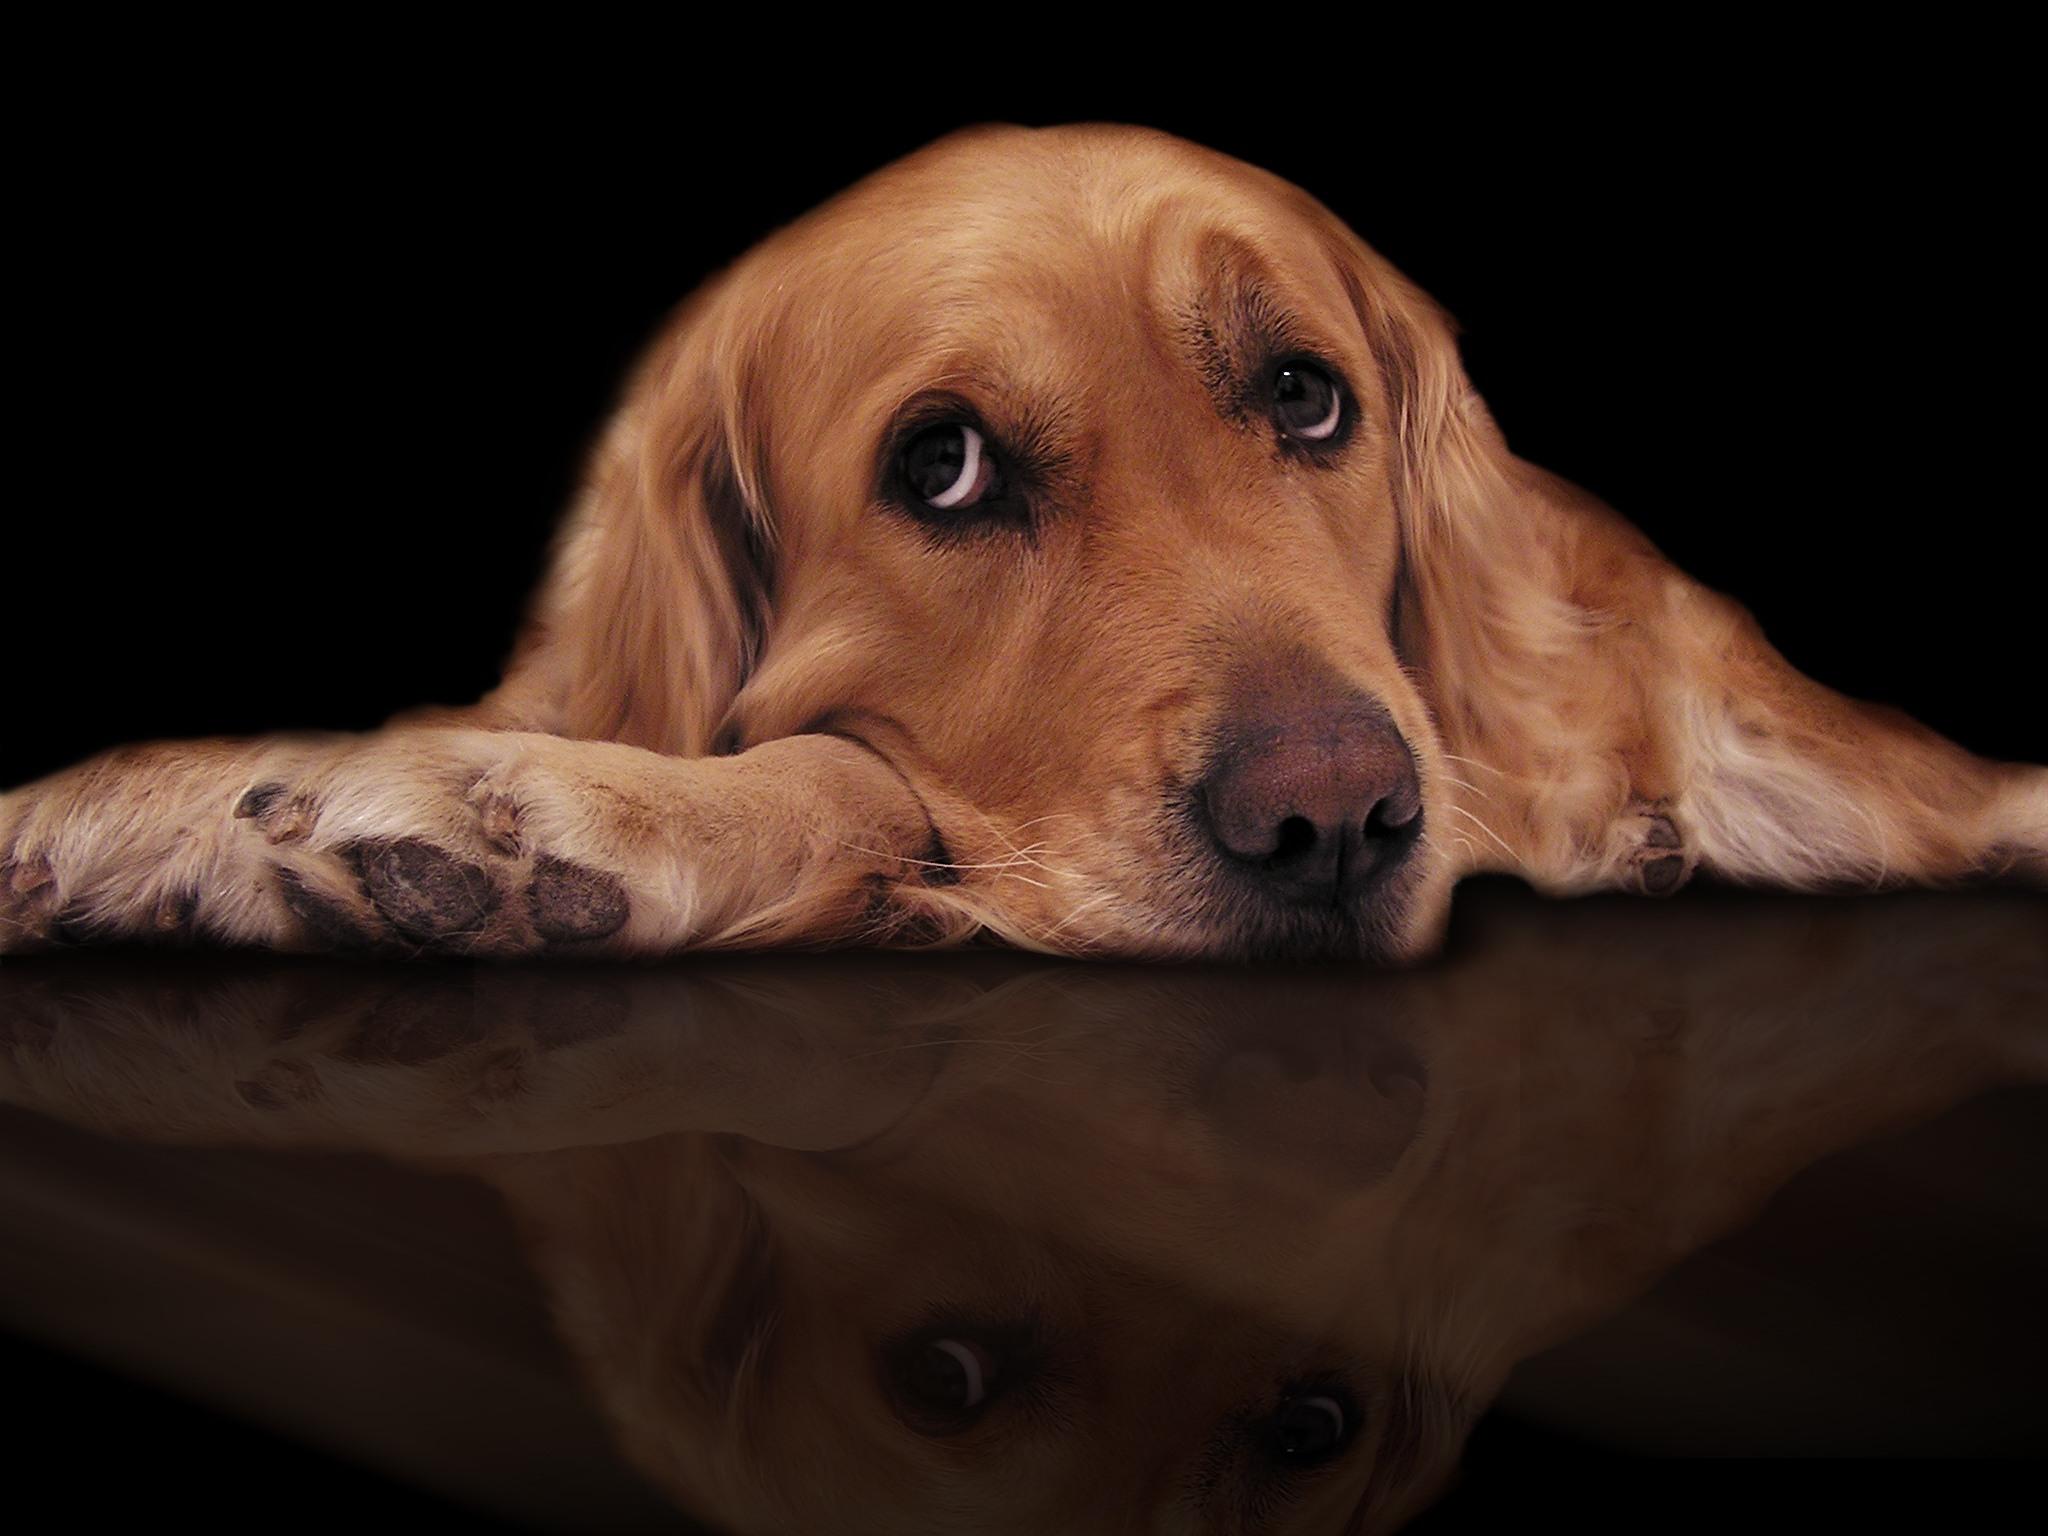 bored_dog_too